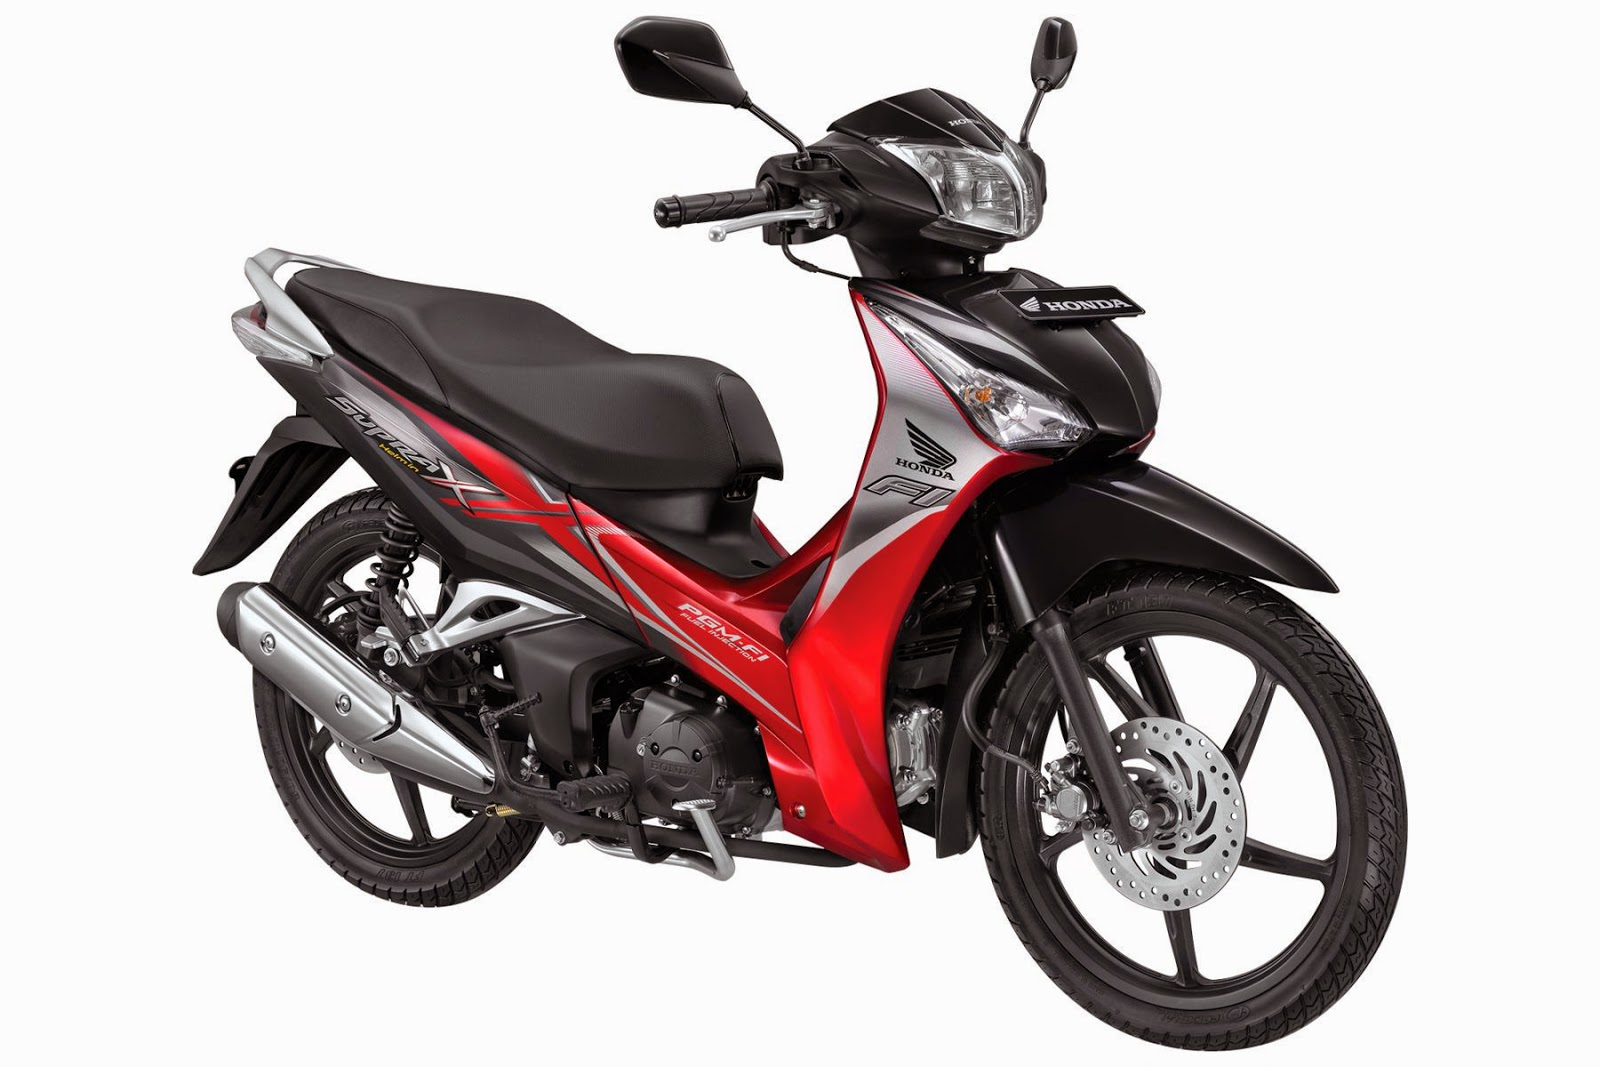 Spesifikasi Honda Supra X 125 Helm in PGM-FI